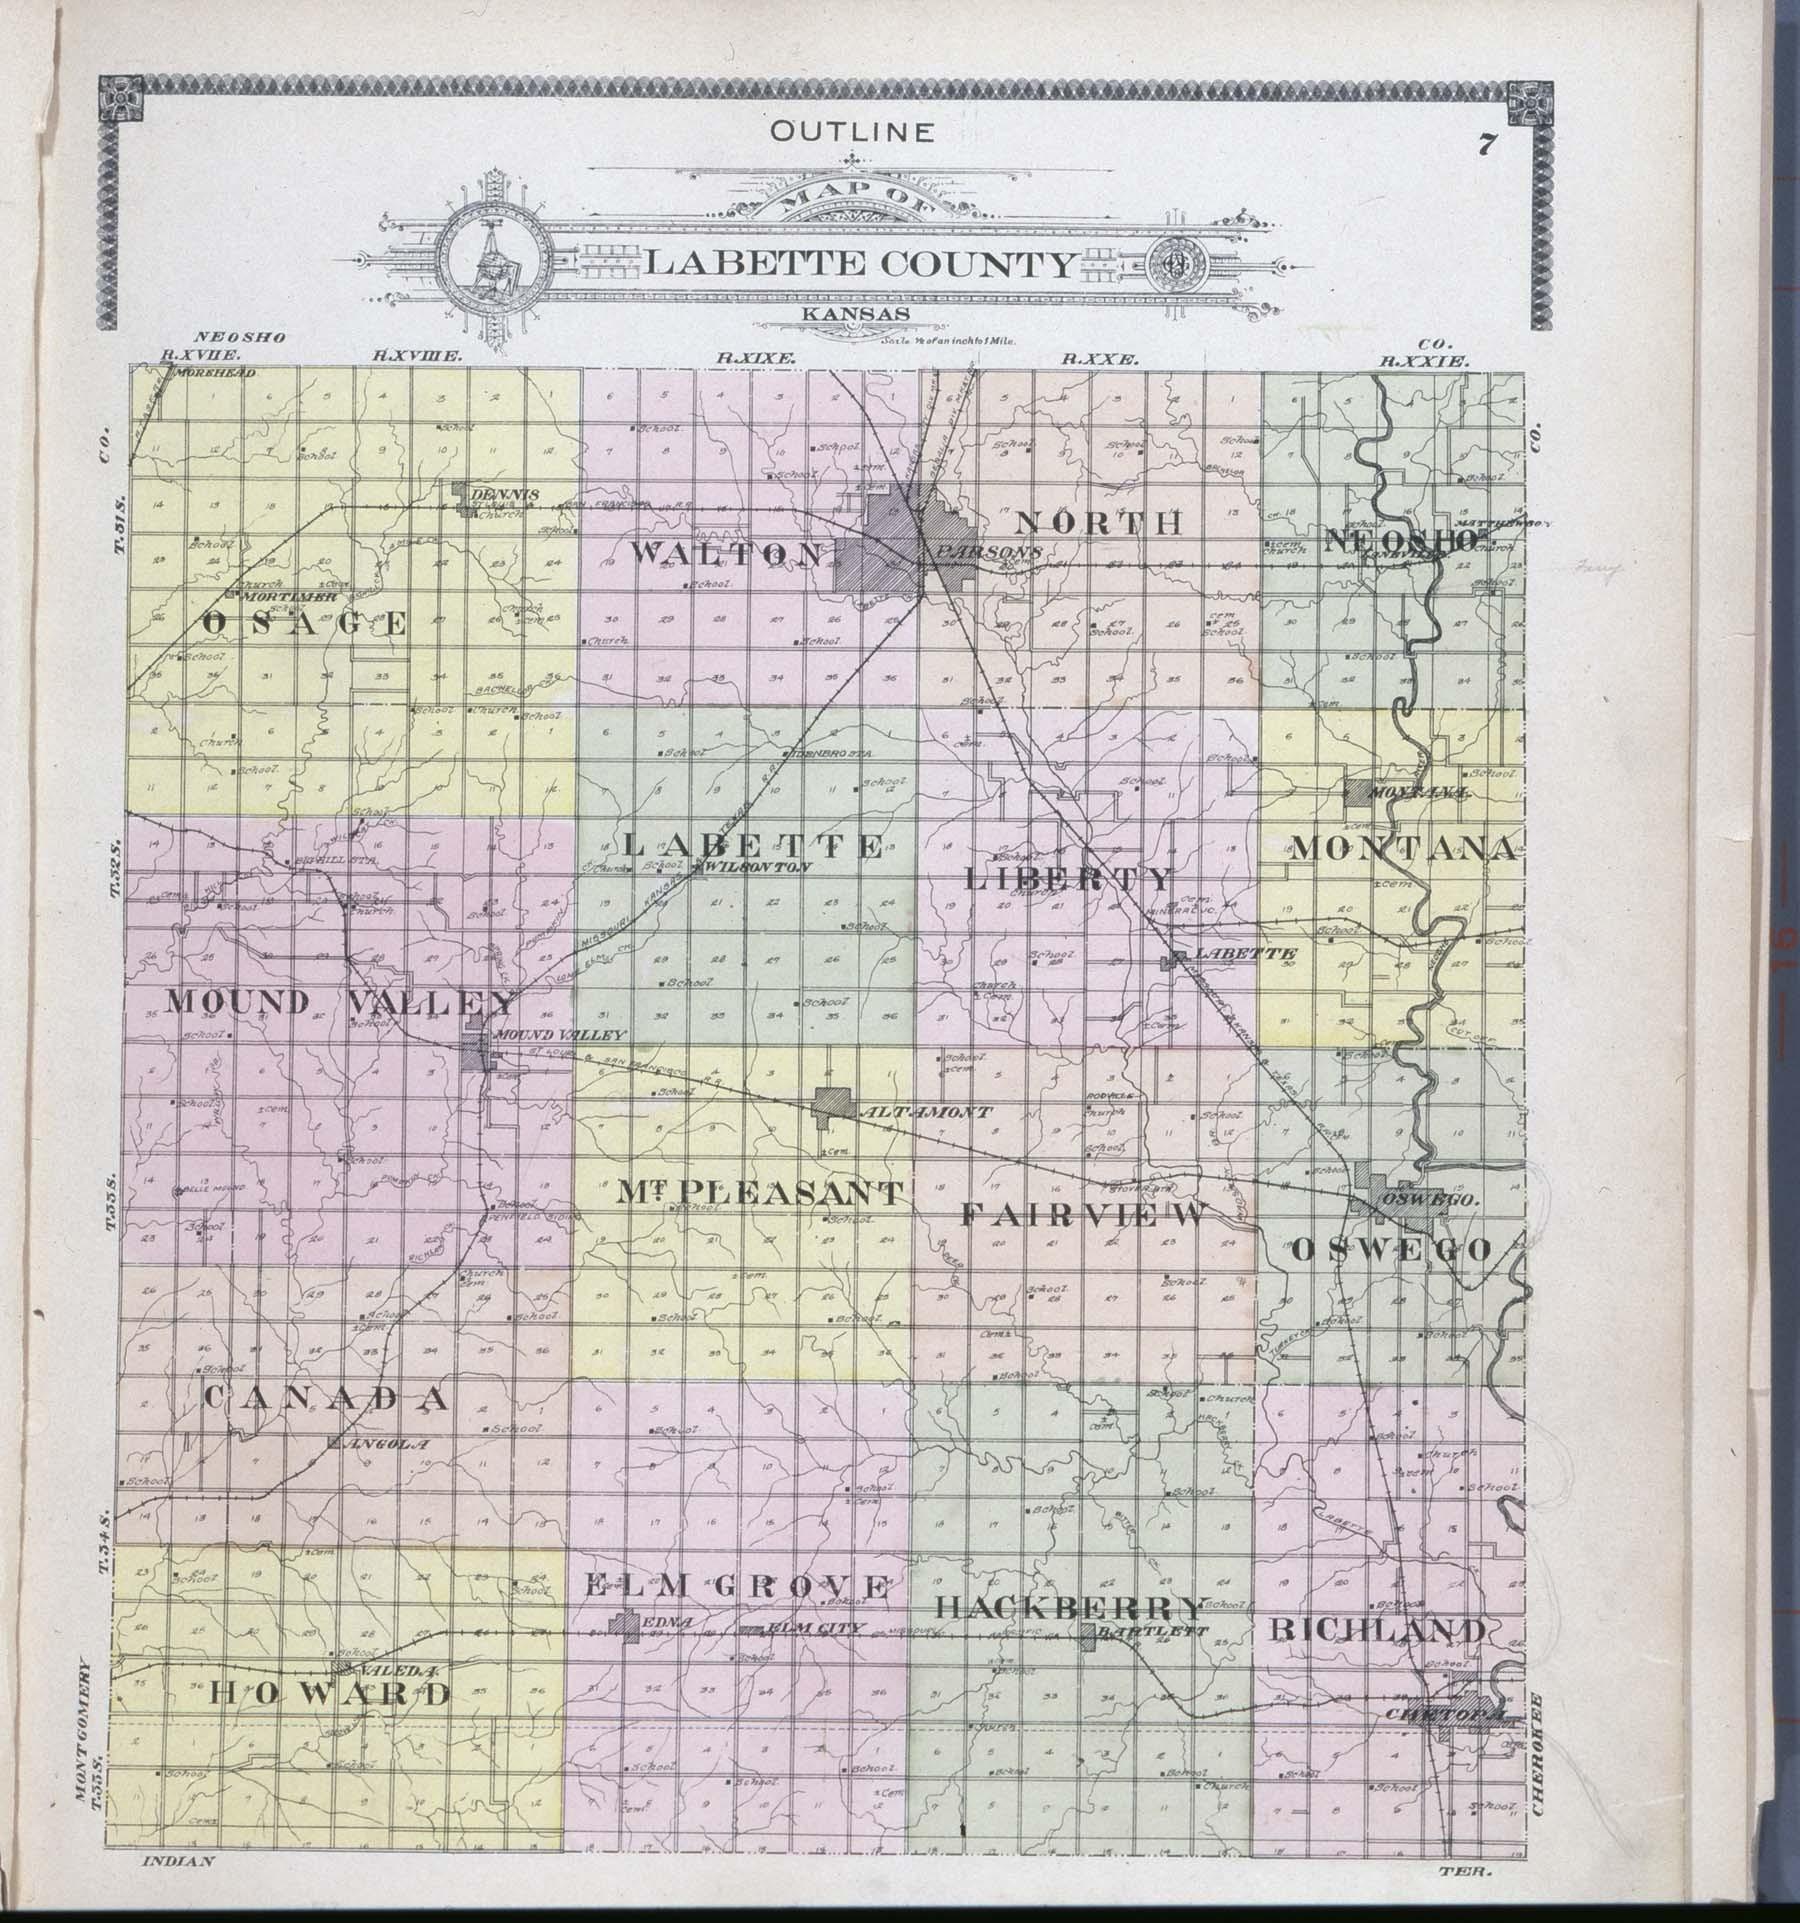 Standard atlas of Labette County, Kansas - 7